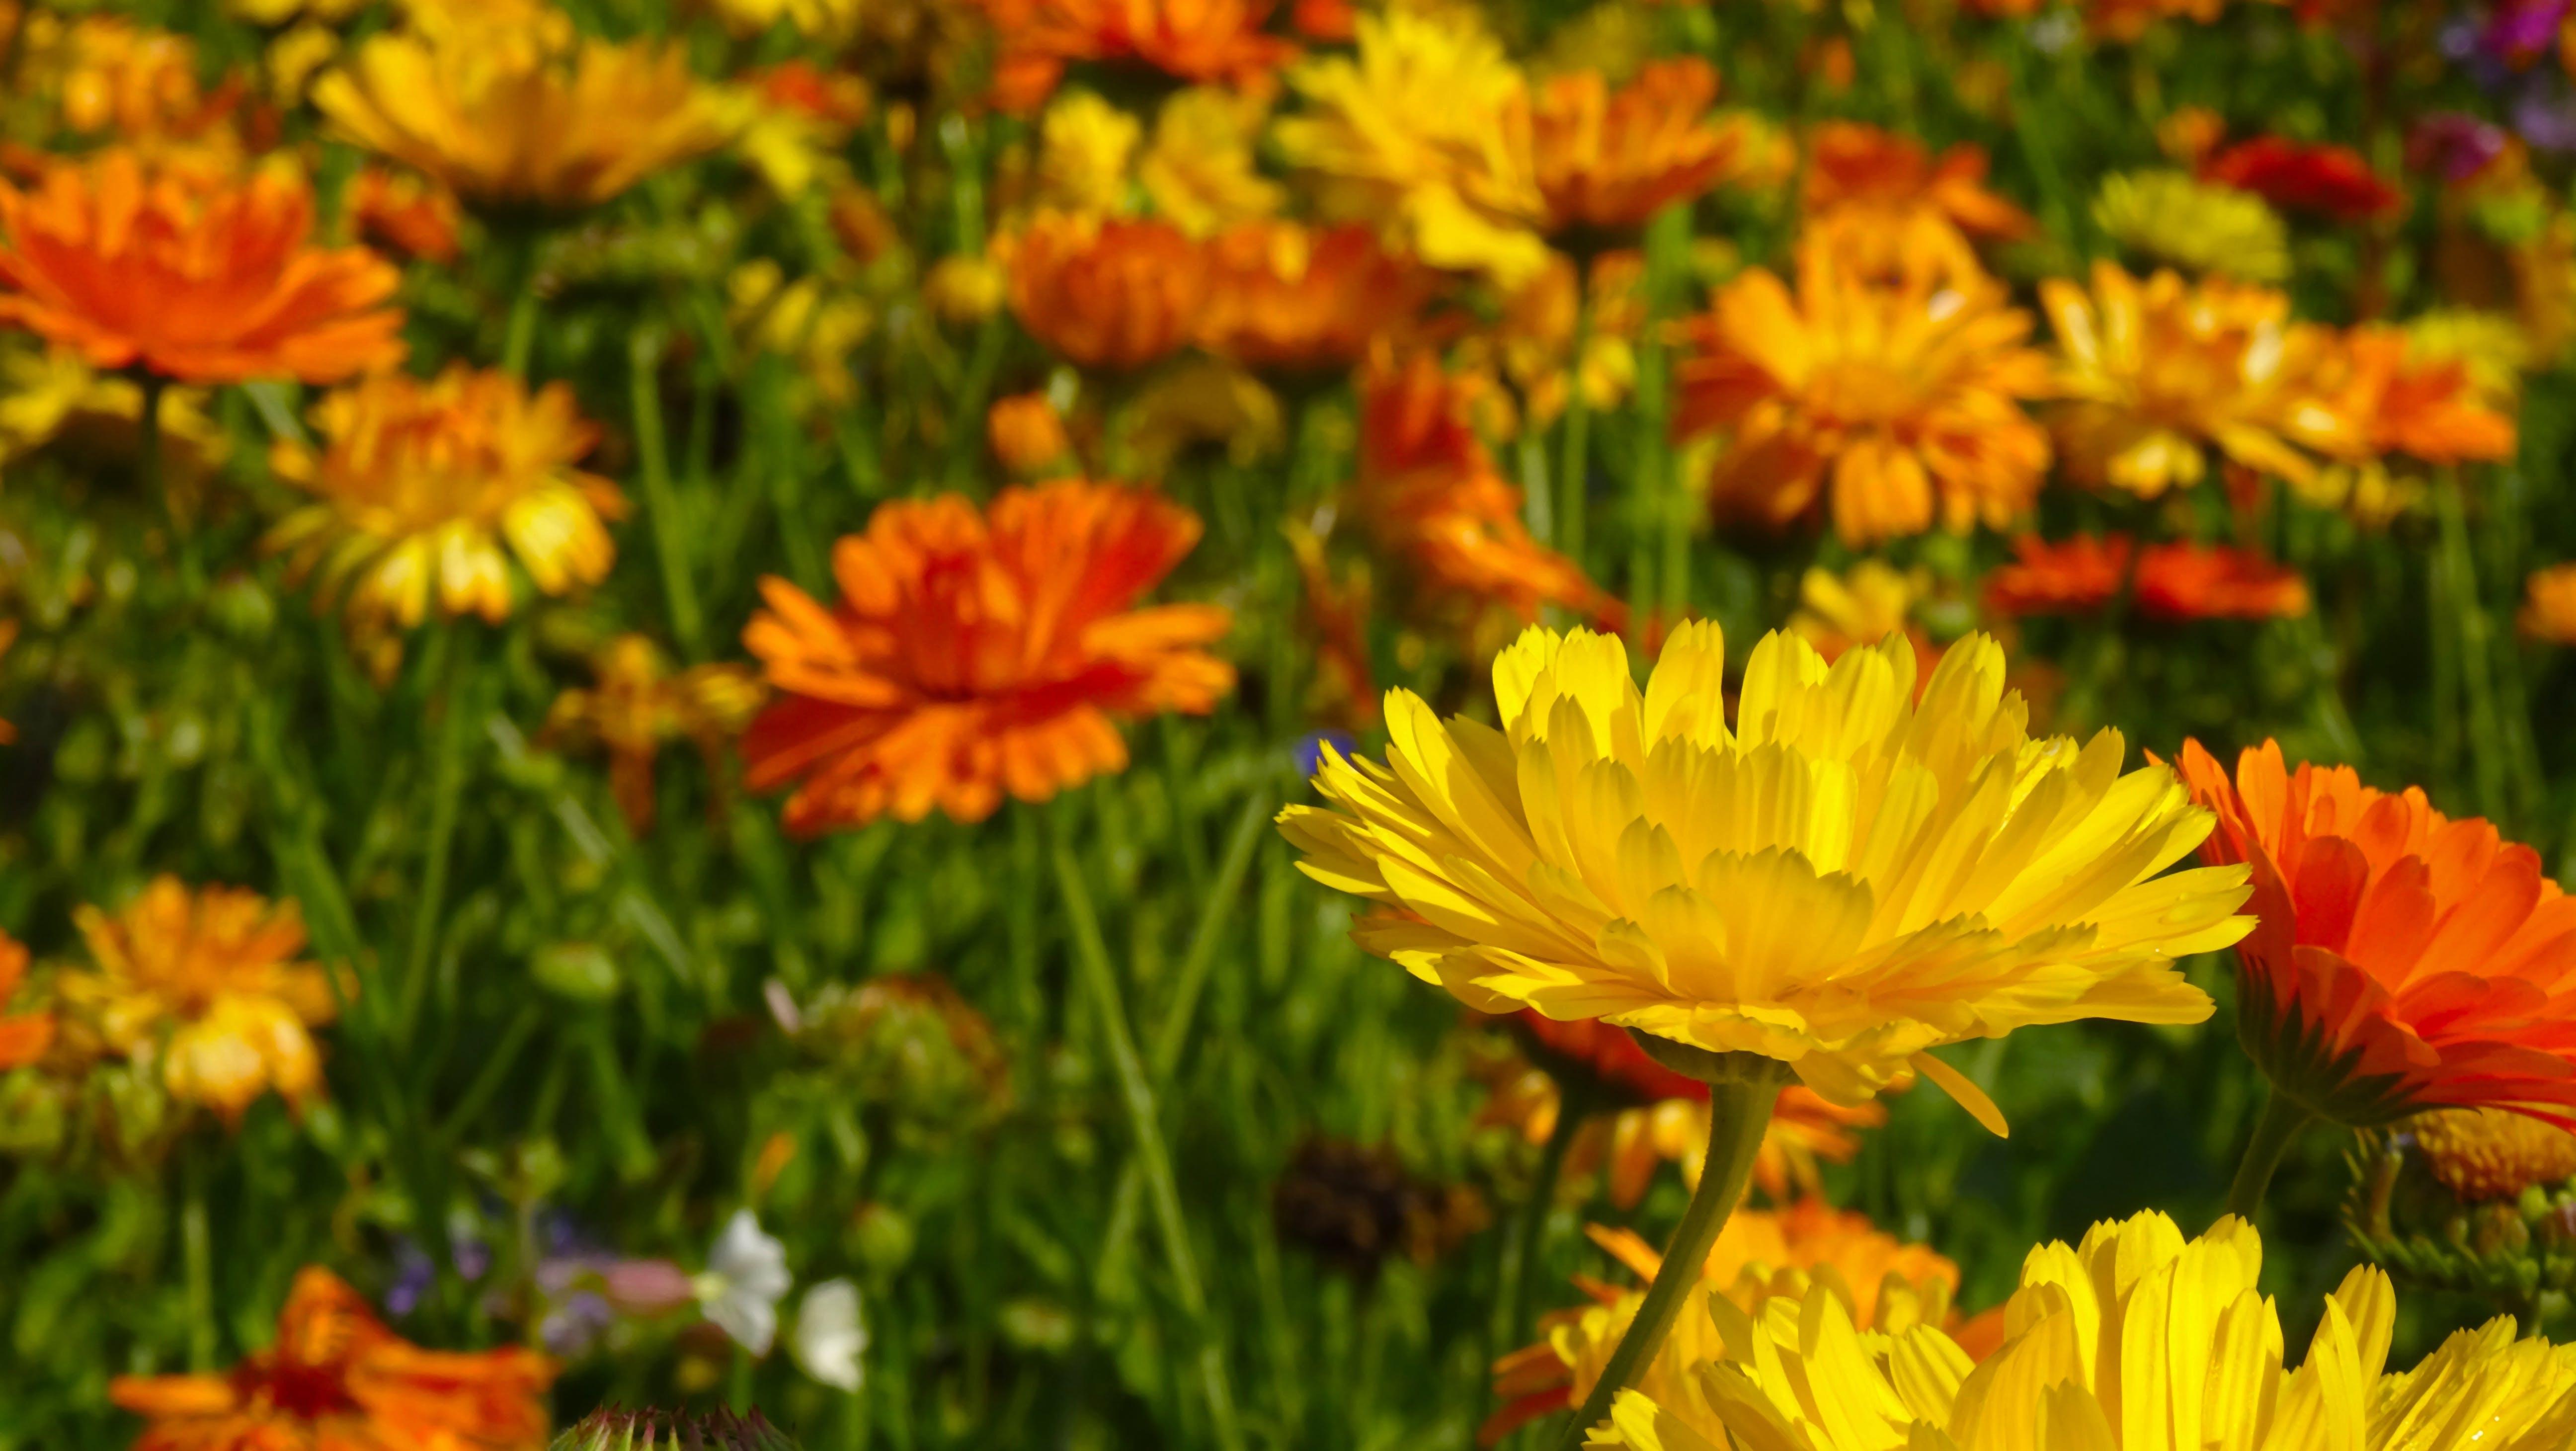 Free stock photo of nature, flowers, summer, yellow